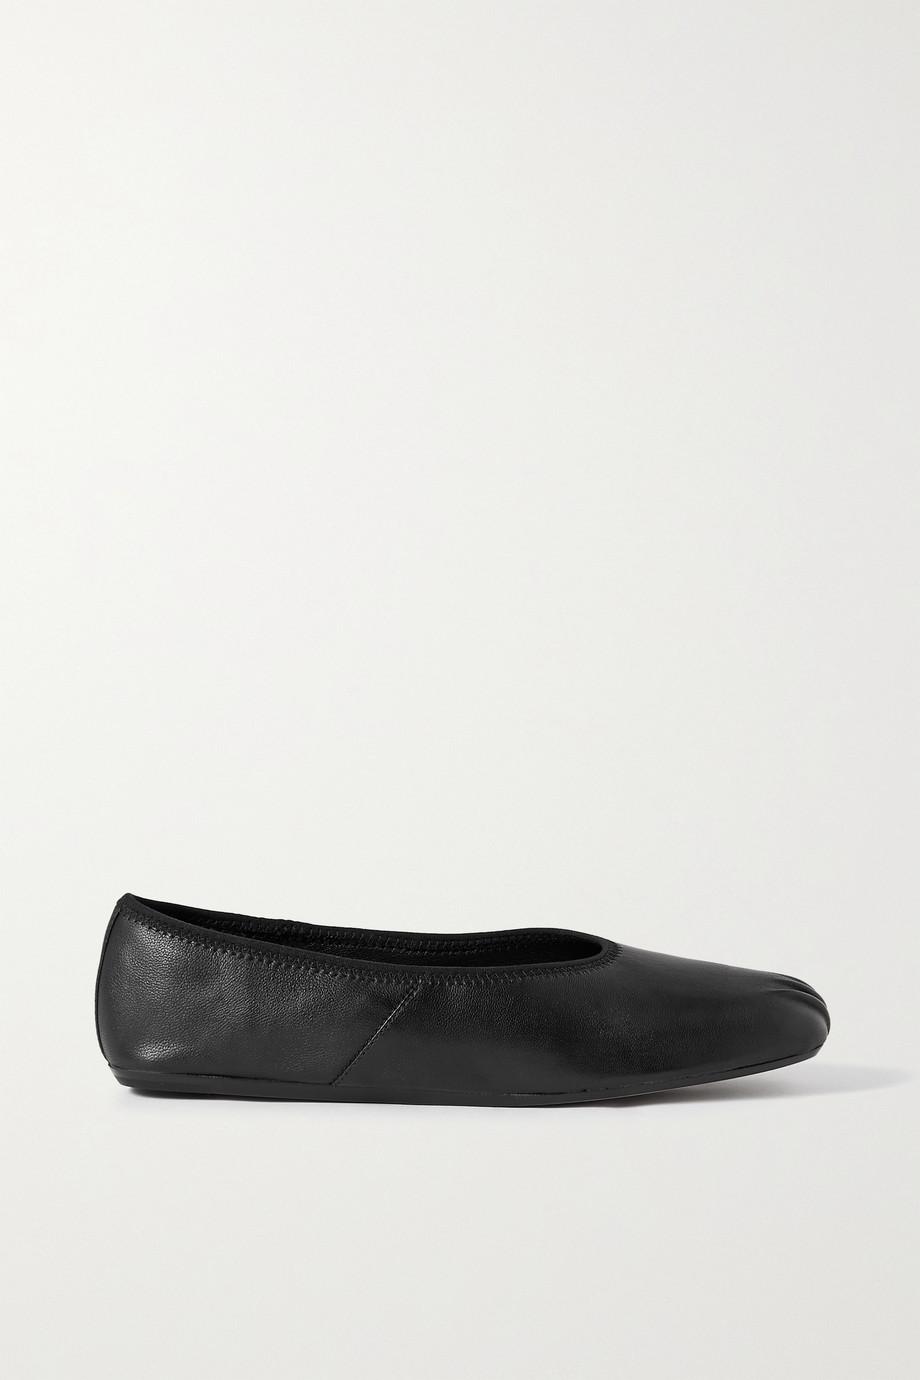 Vince Kiana gathered leather ballet flats